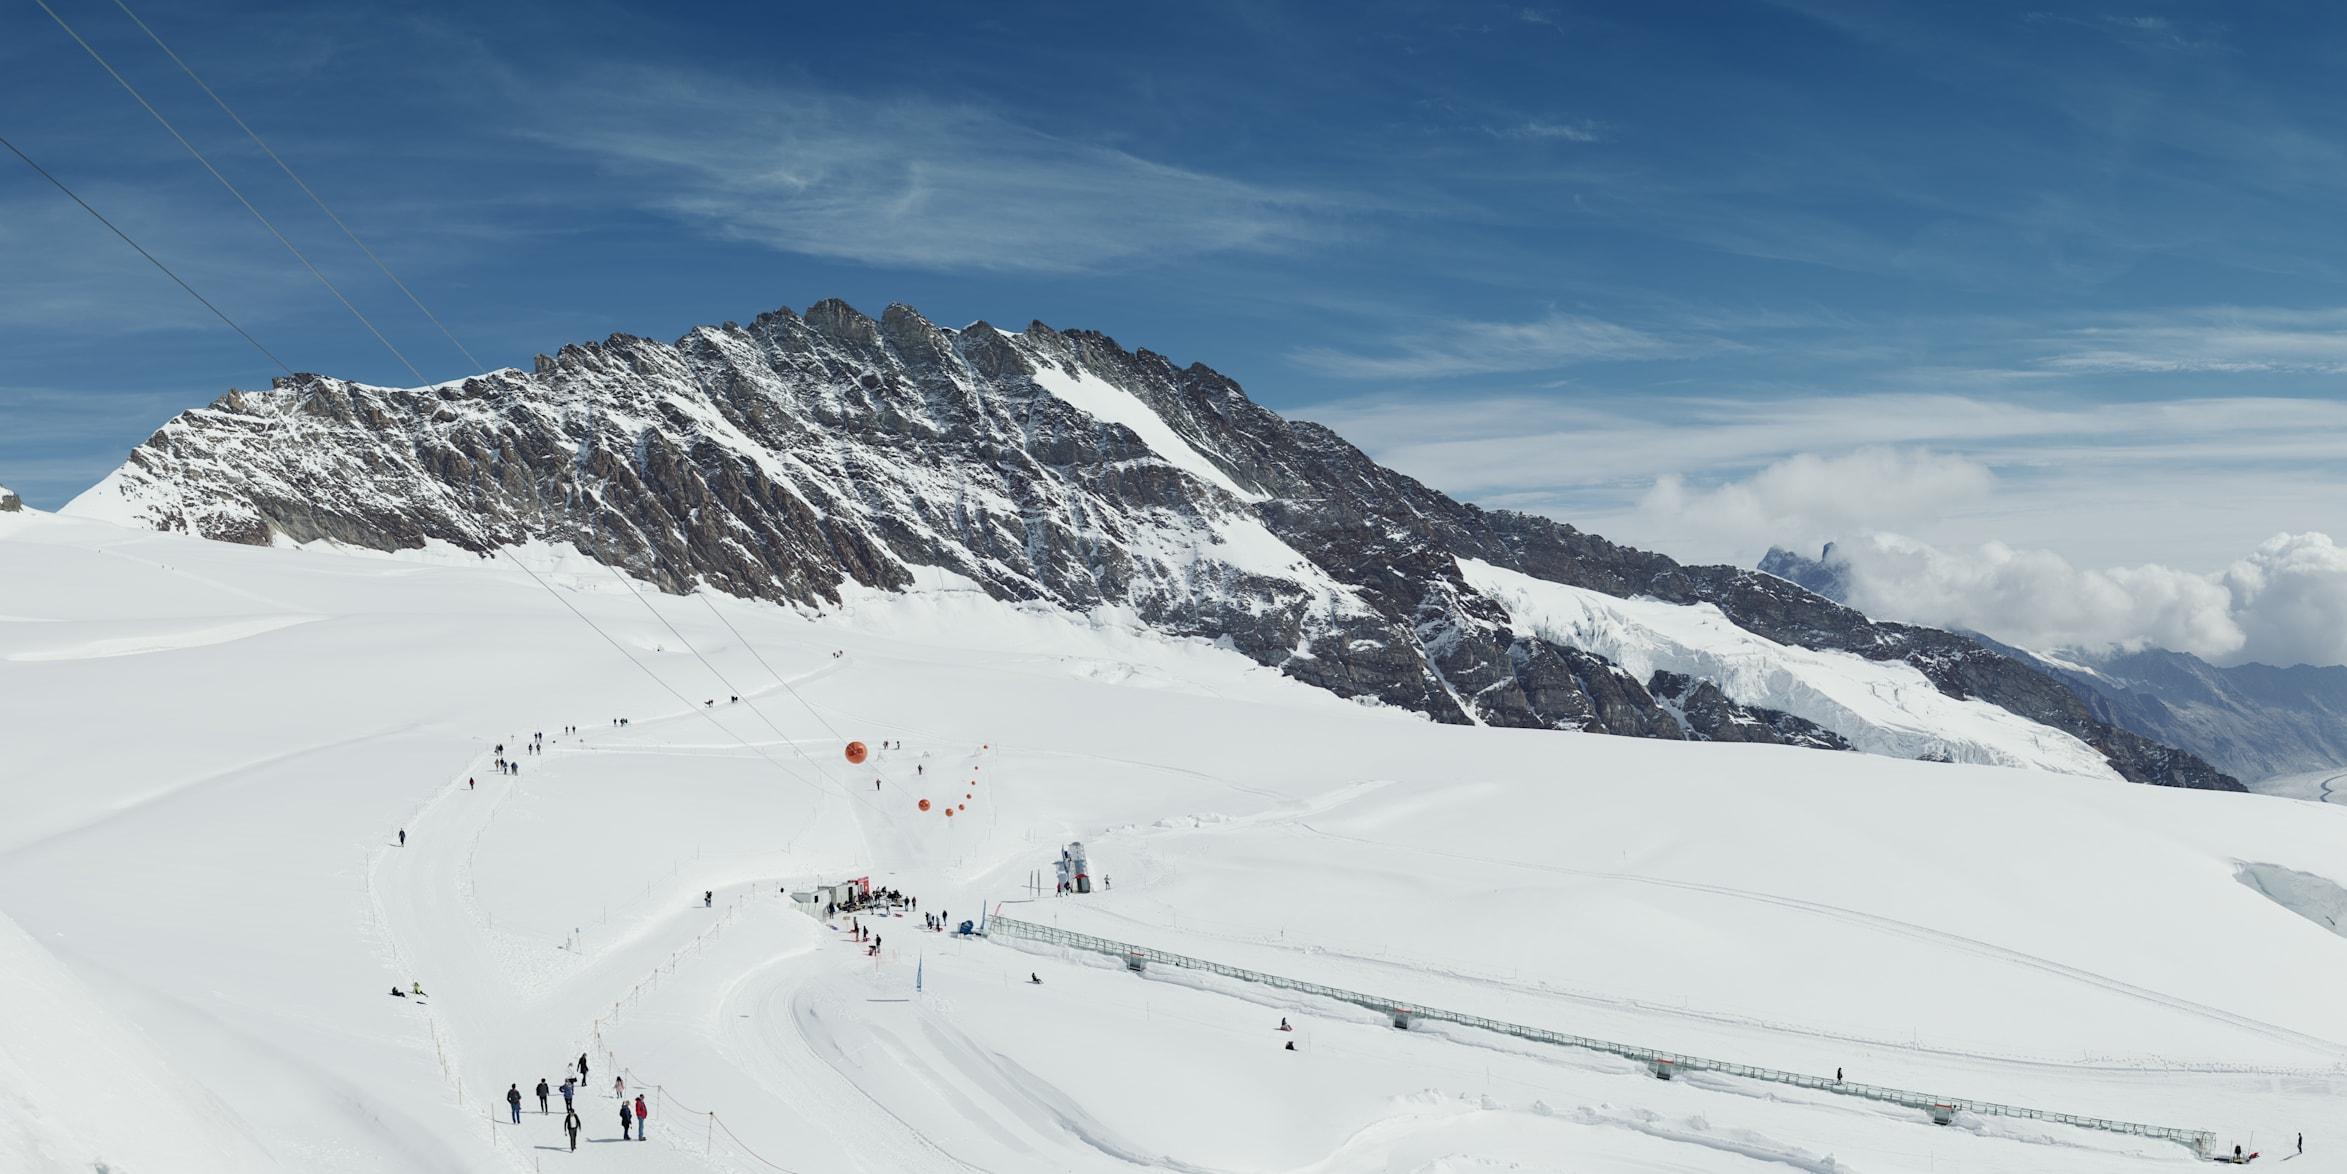 Jungfraujoch Snow Fun Park Adventure Panorama Gletscher